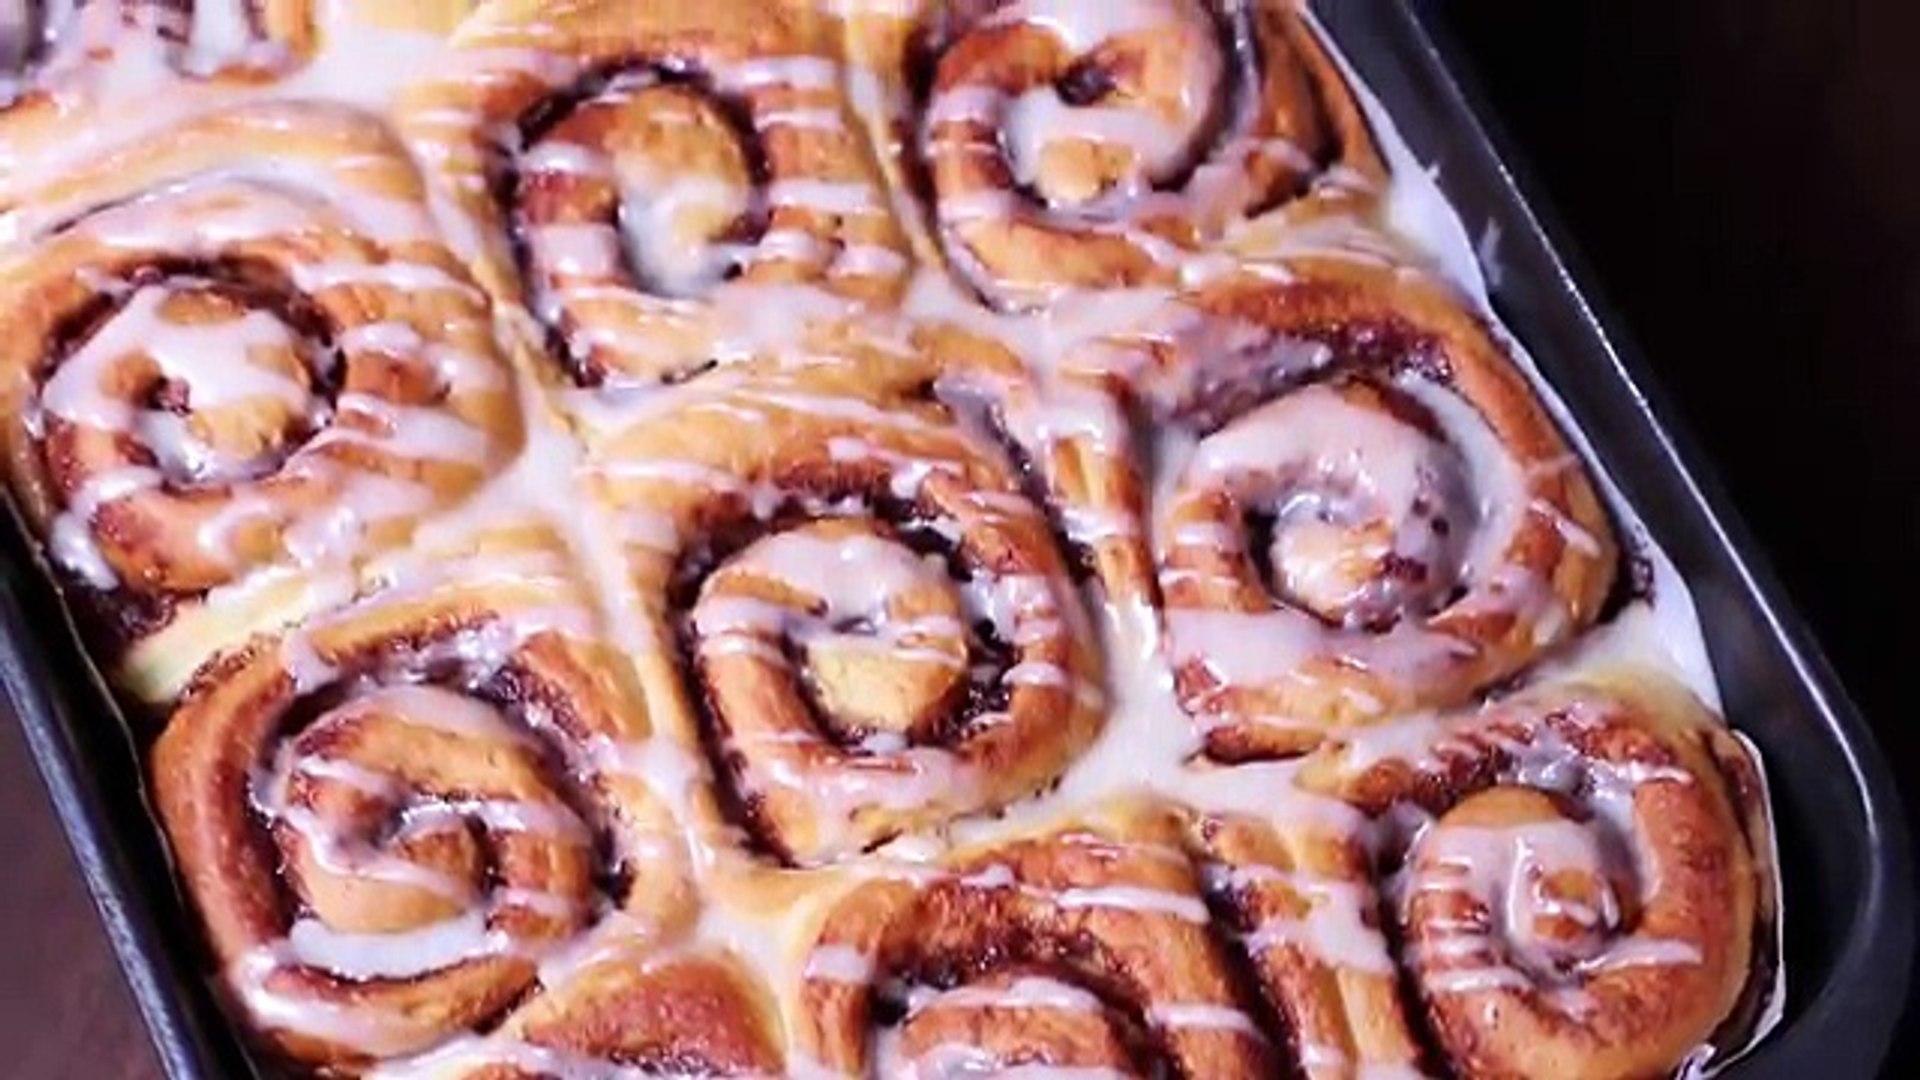 Homemade Cinnamon Rolls Recipe Laura Vitale Laura In The Kitchen Episode 300 Video Dailymotion